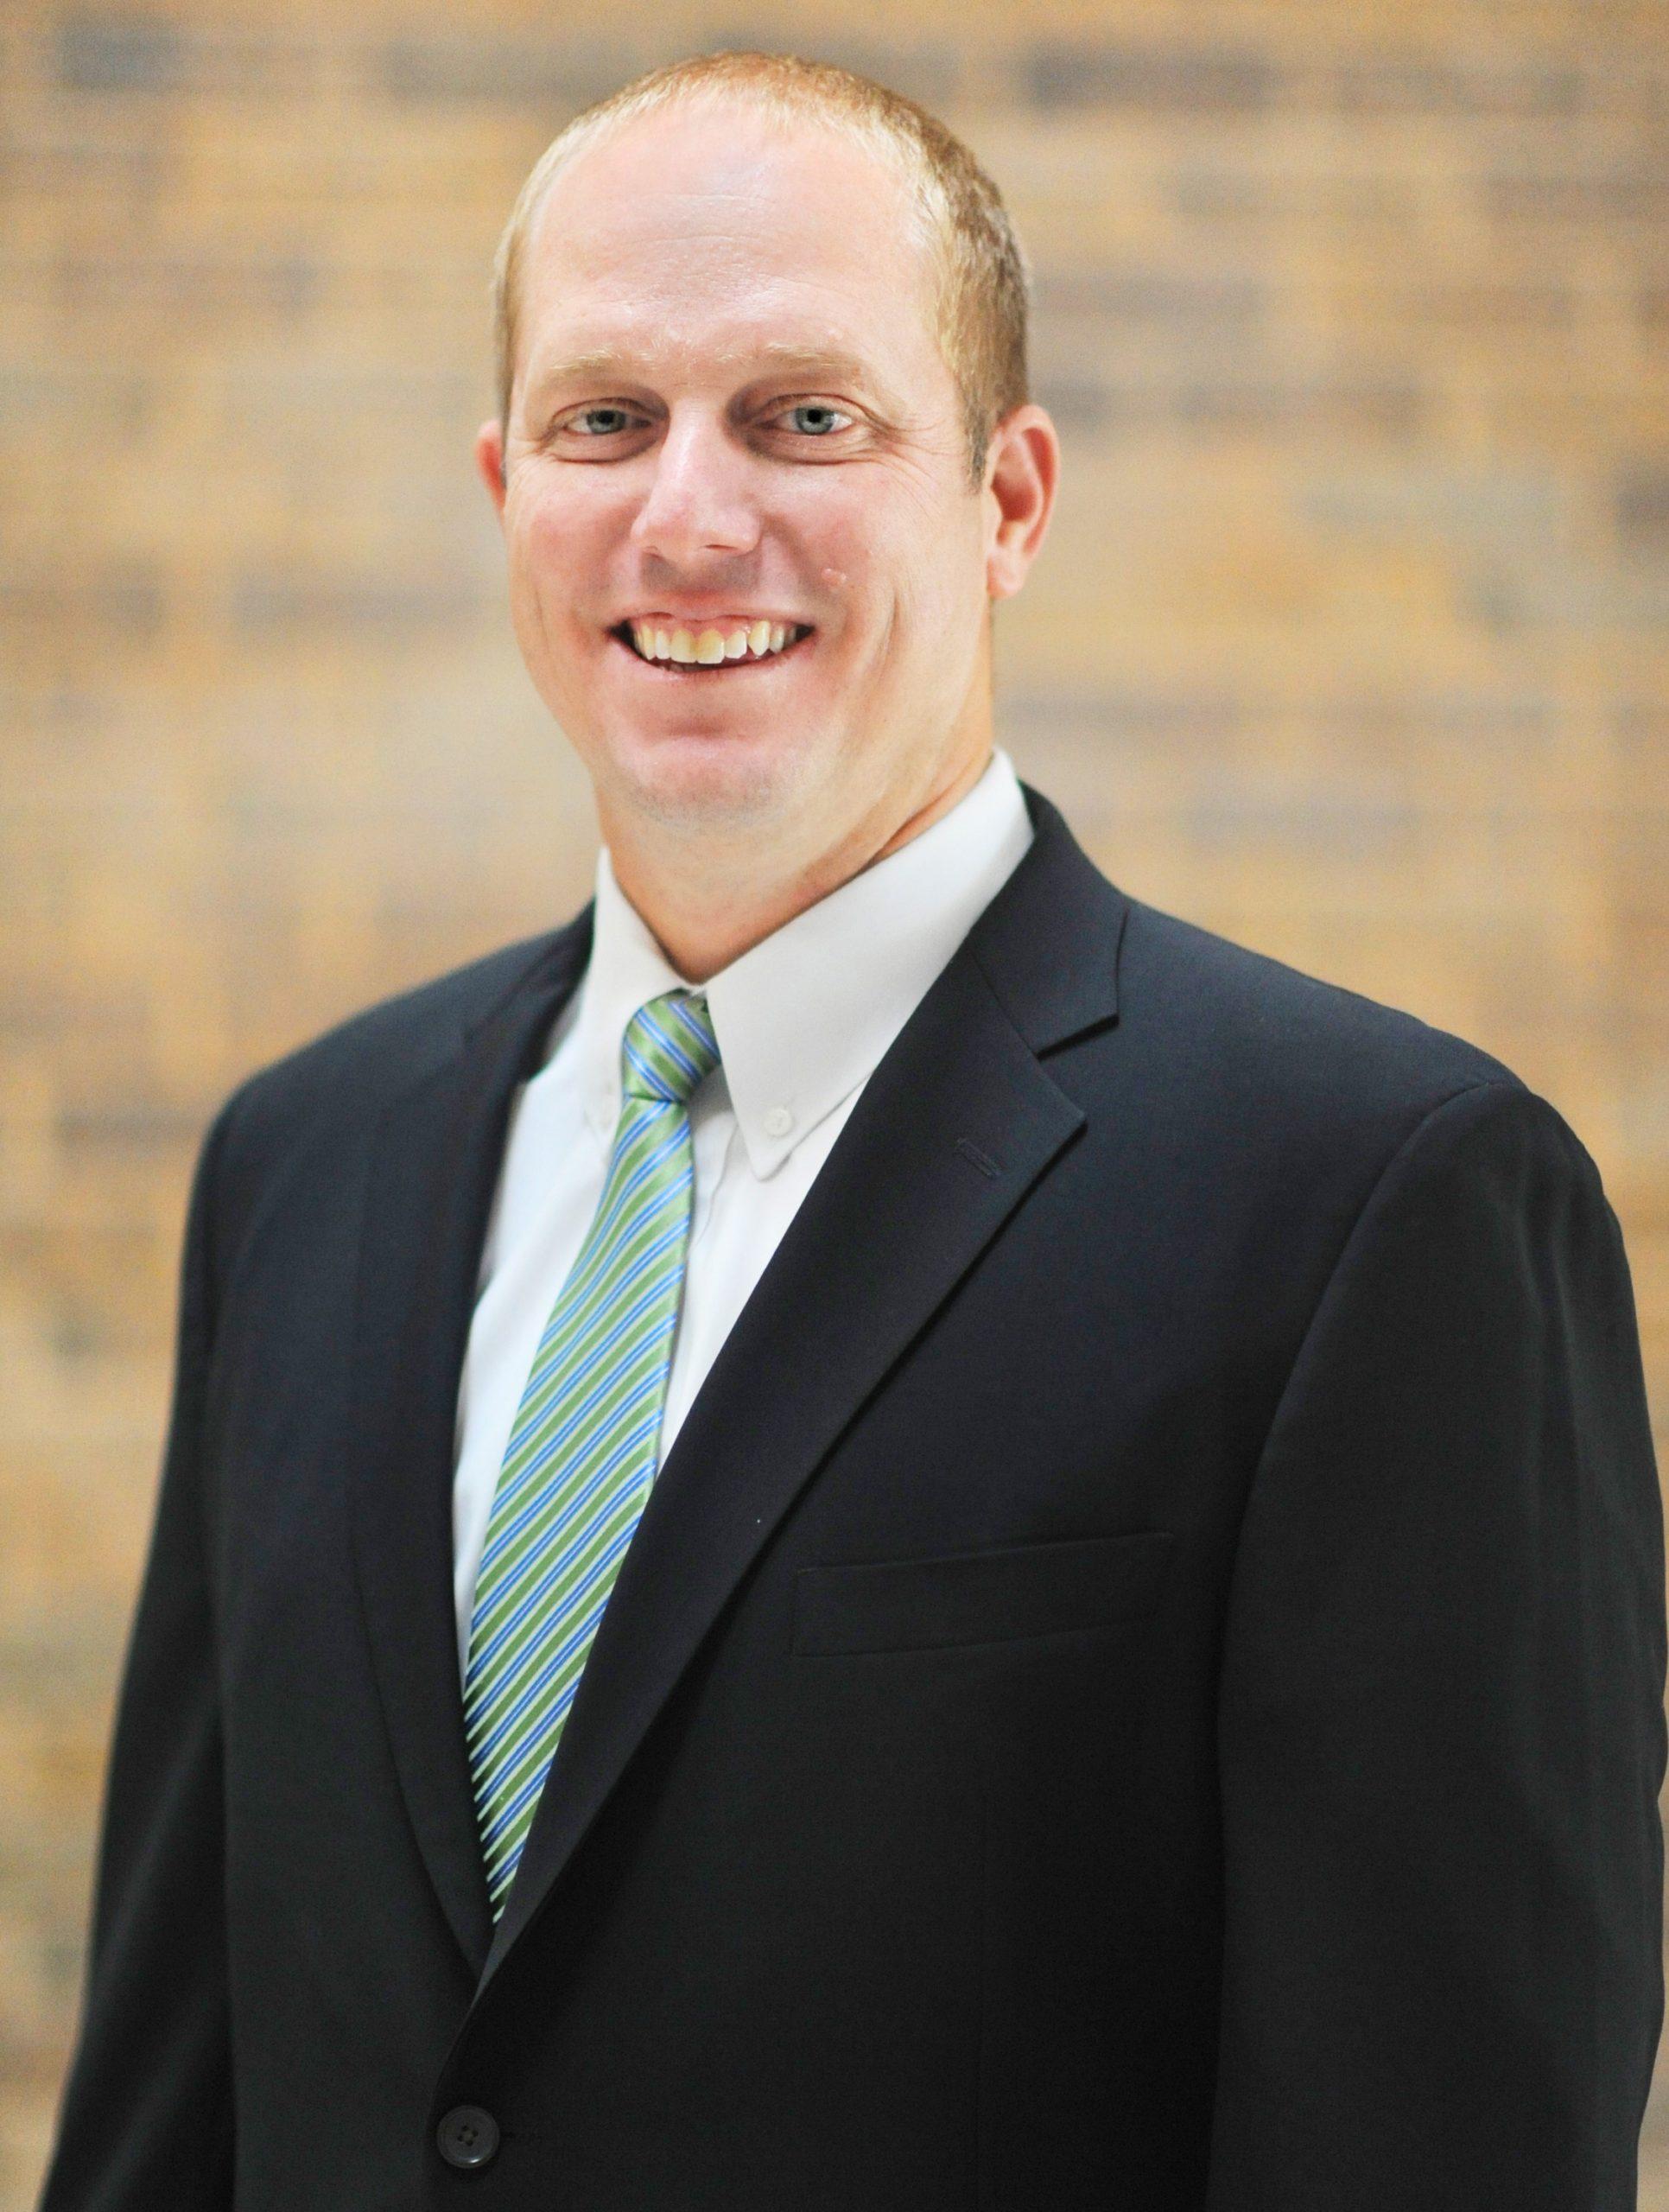 Brandon McDaniel, LEED AP